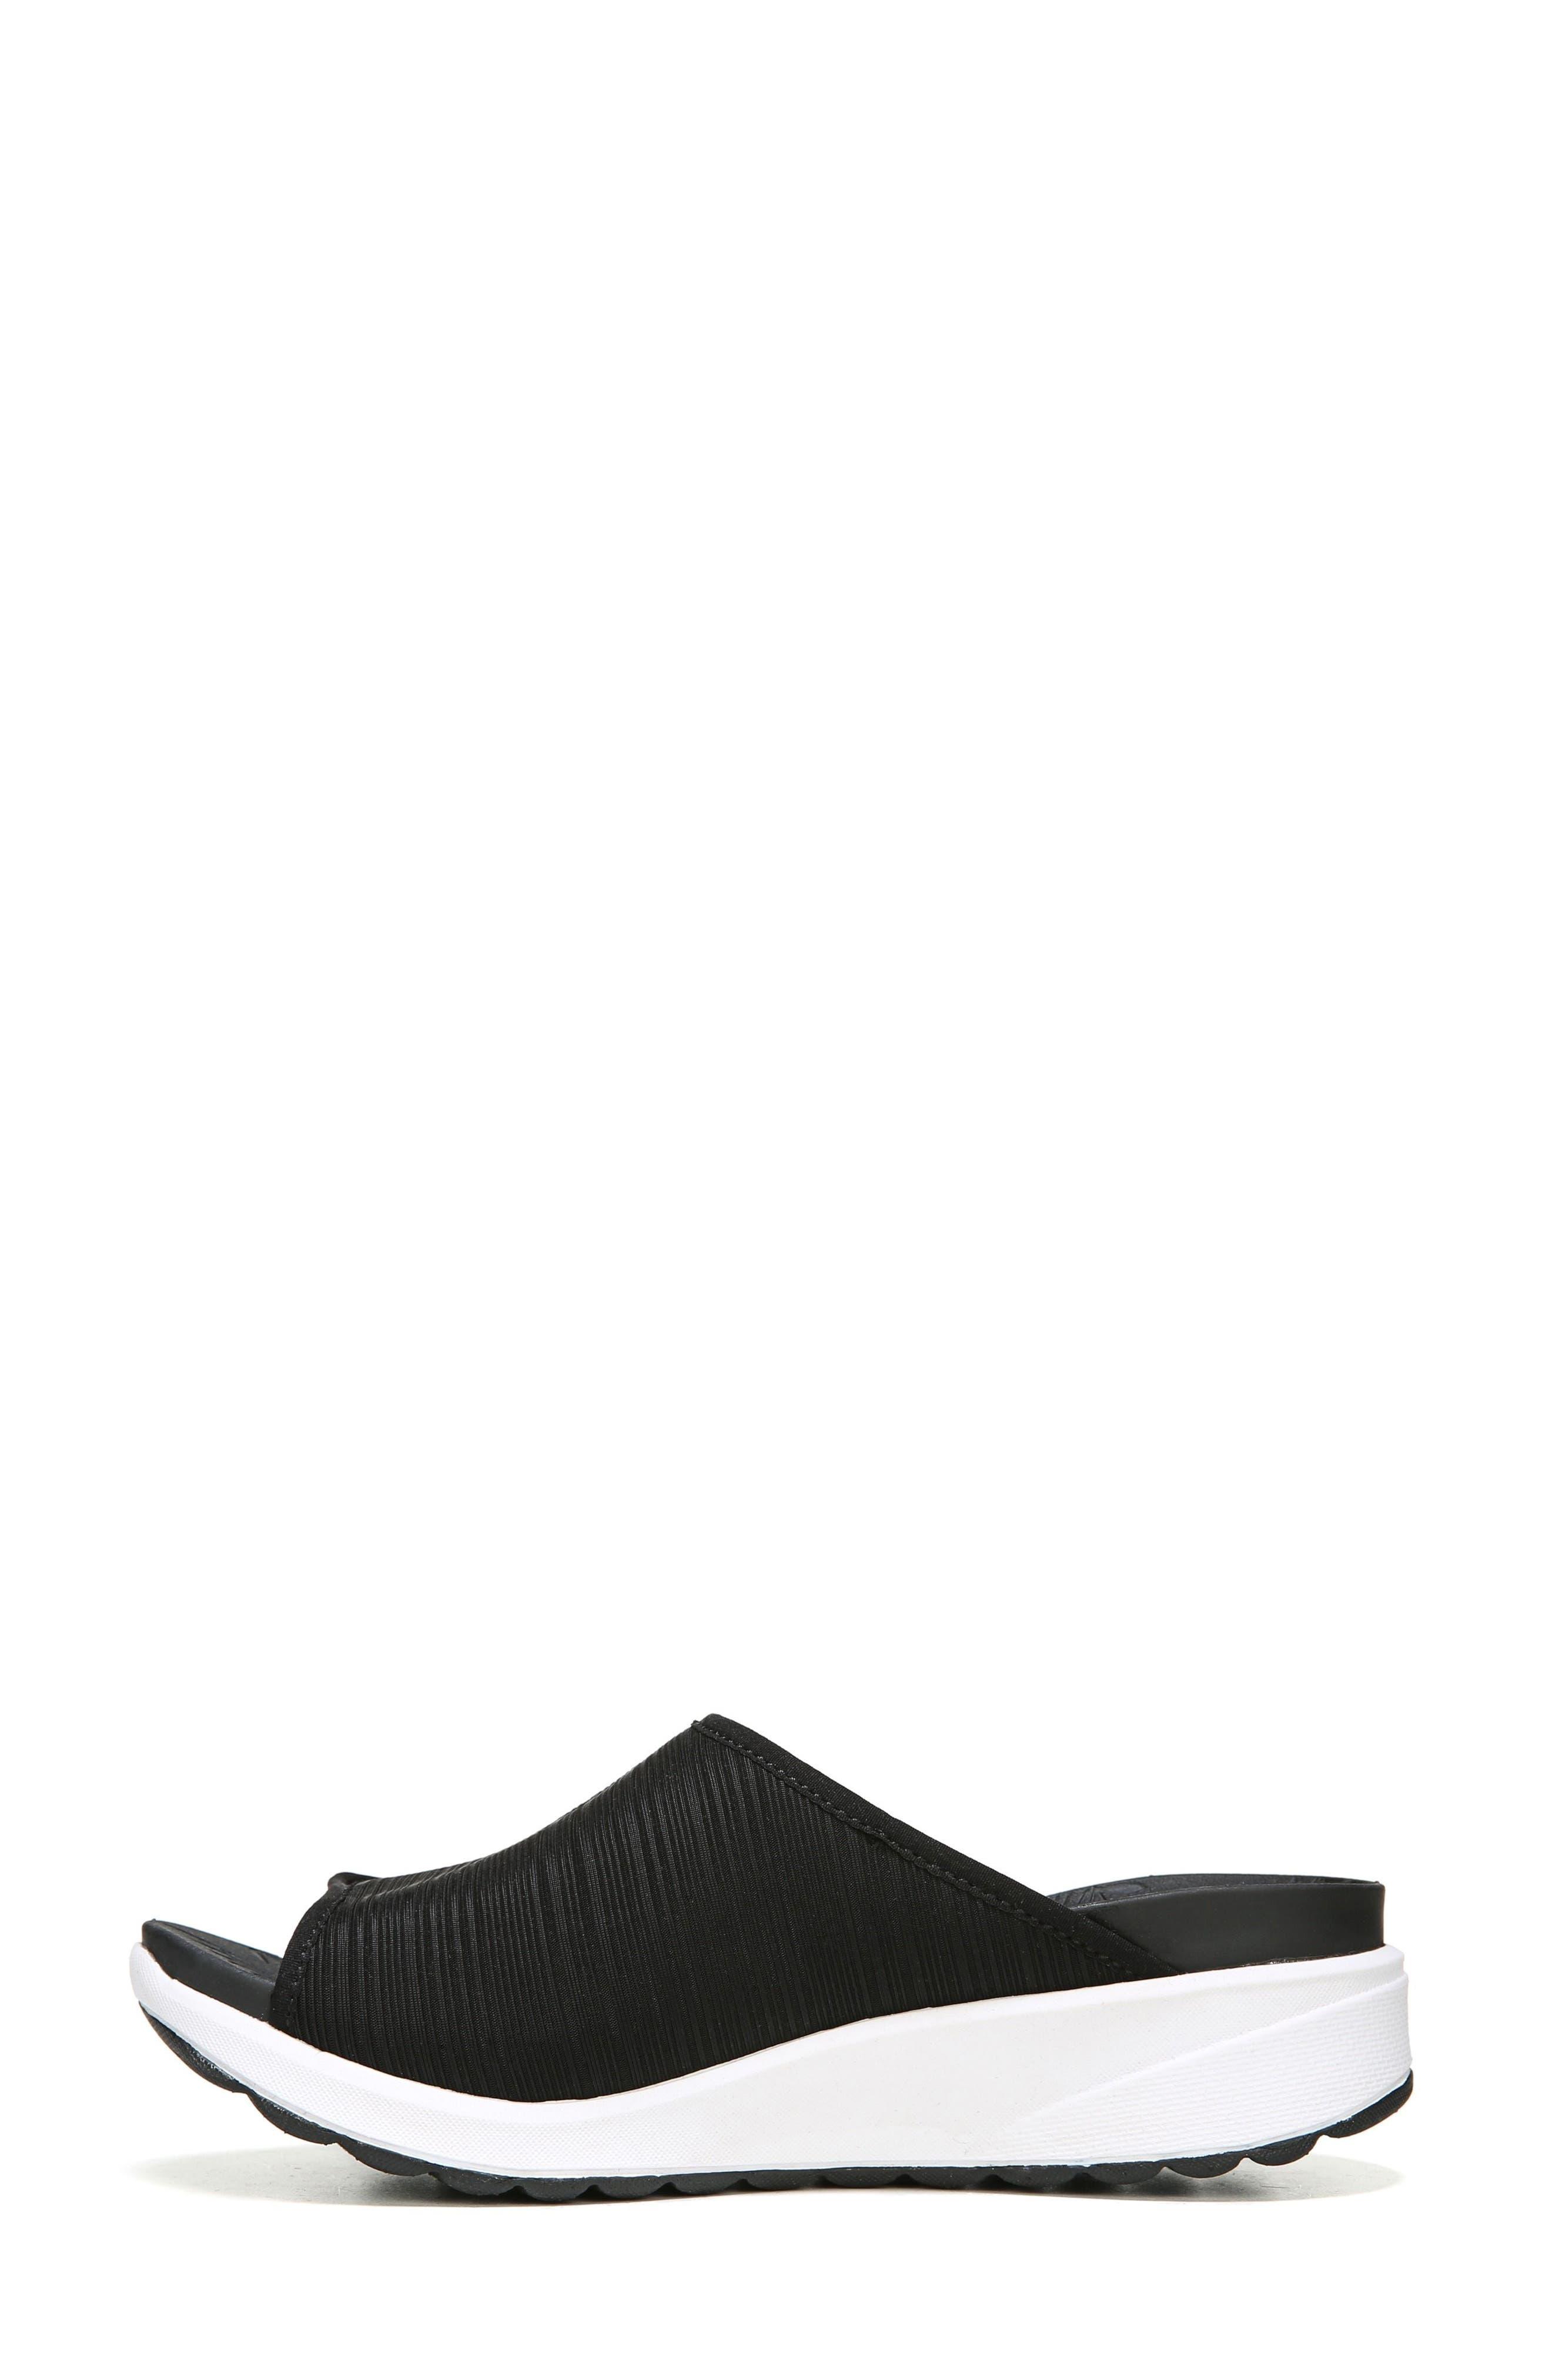 Galaxy Slide Sandal,                             Alternate thumbnail 3, color,                             BLACK FABRIC